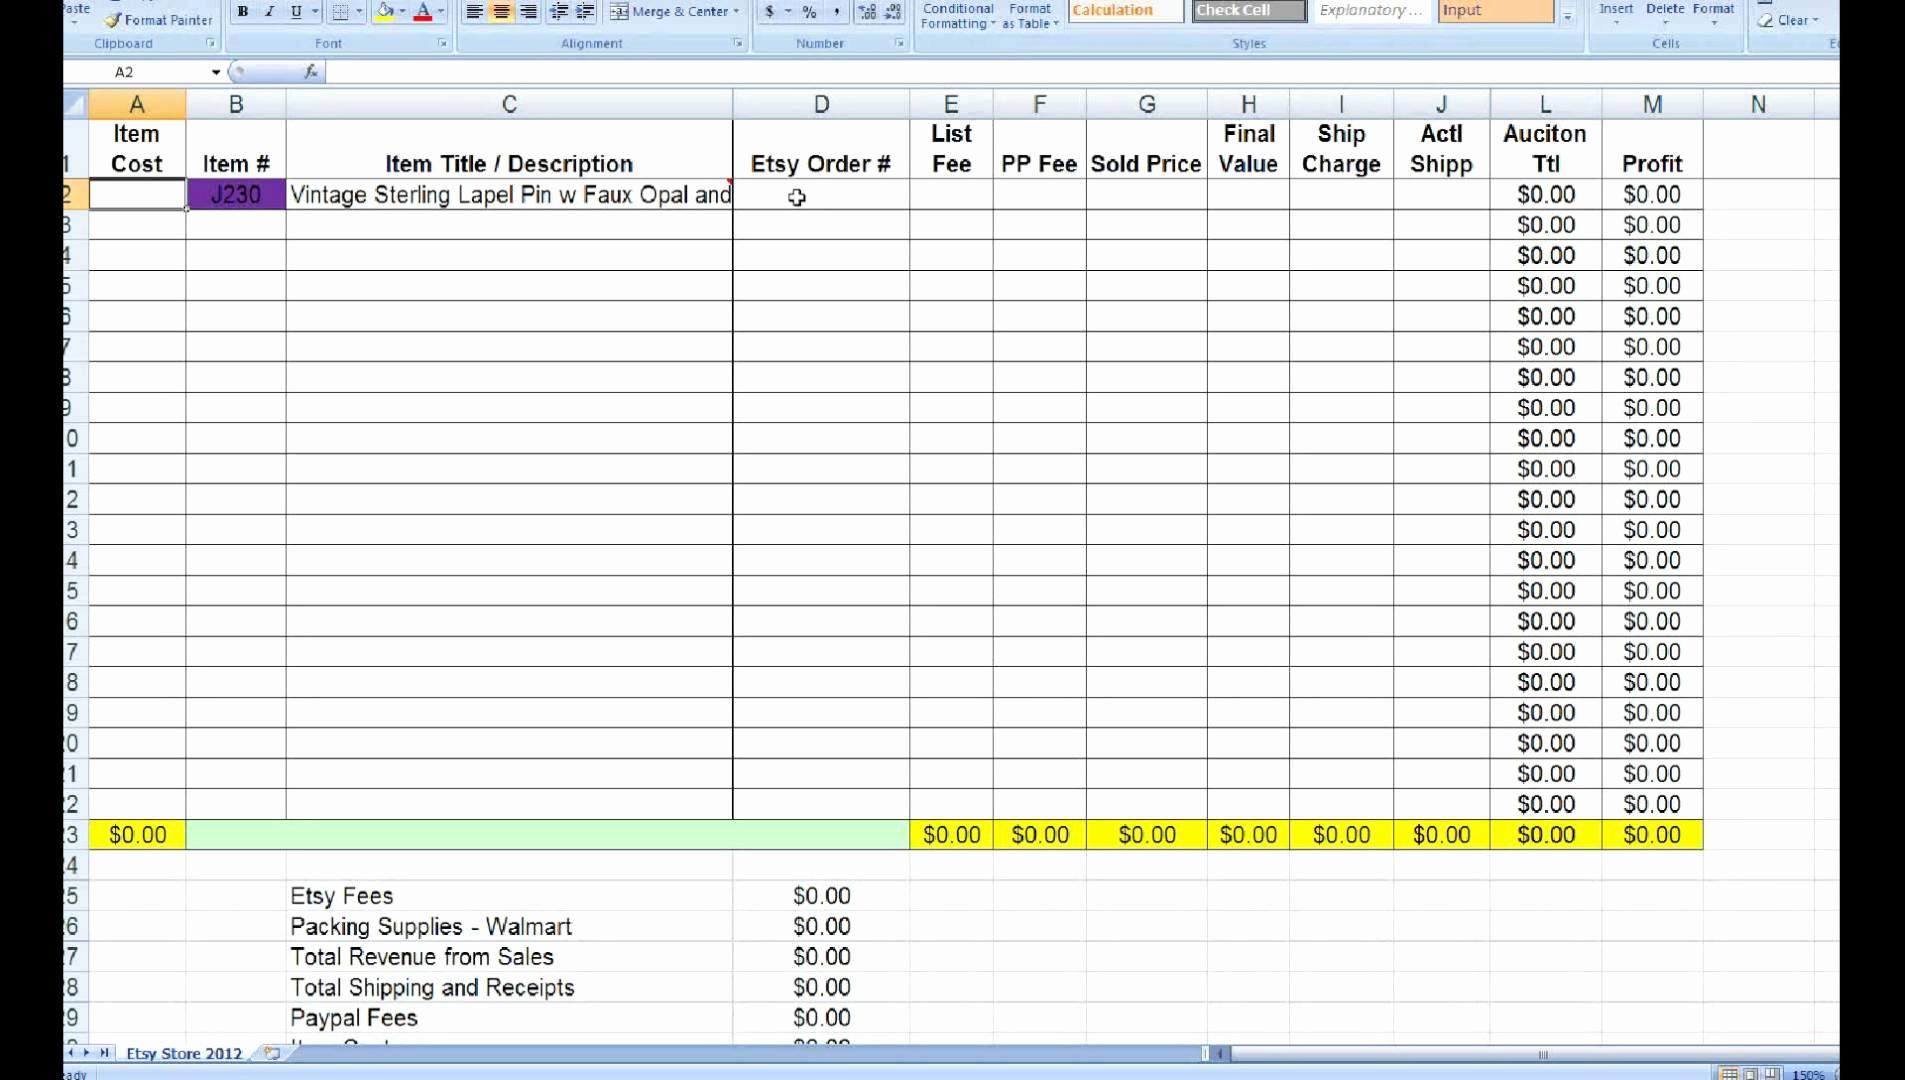 Condo Reserve Study Spreadsheet Pertaining To Free Reserve Study Spreadsheet How To Create An Excel Spreadsheet